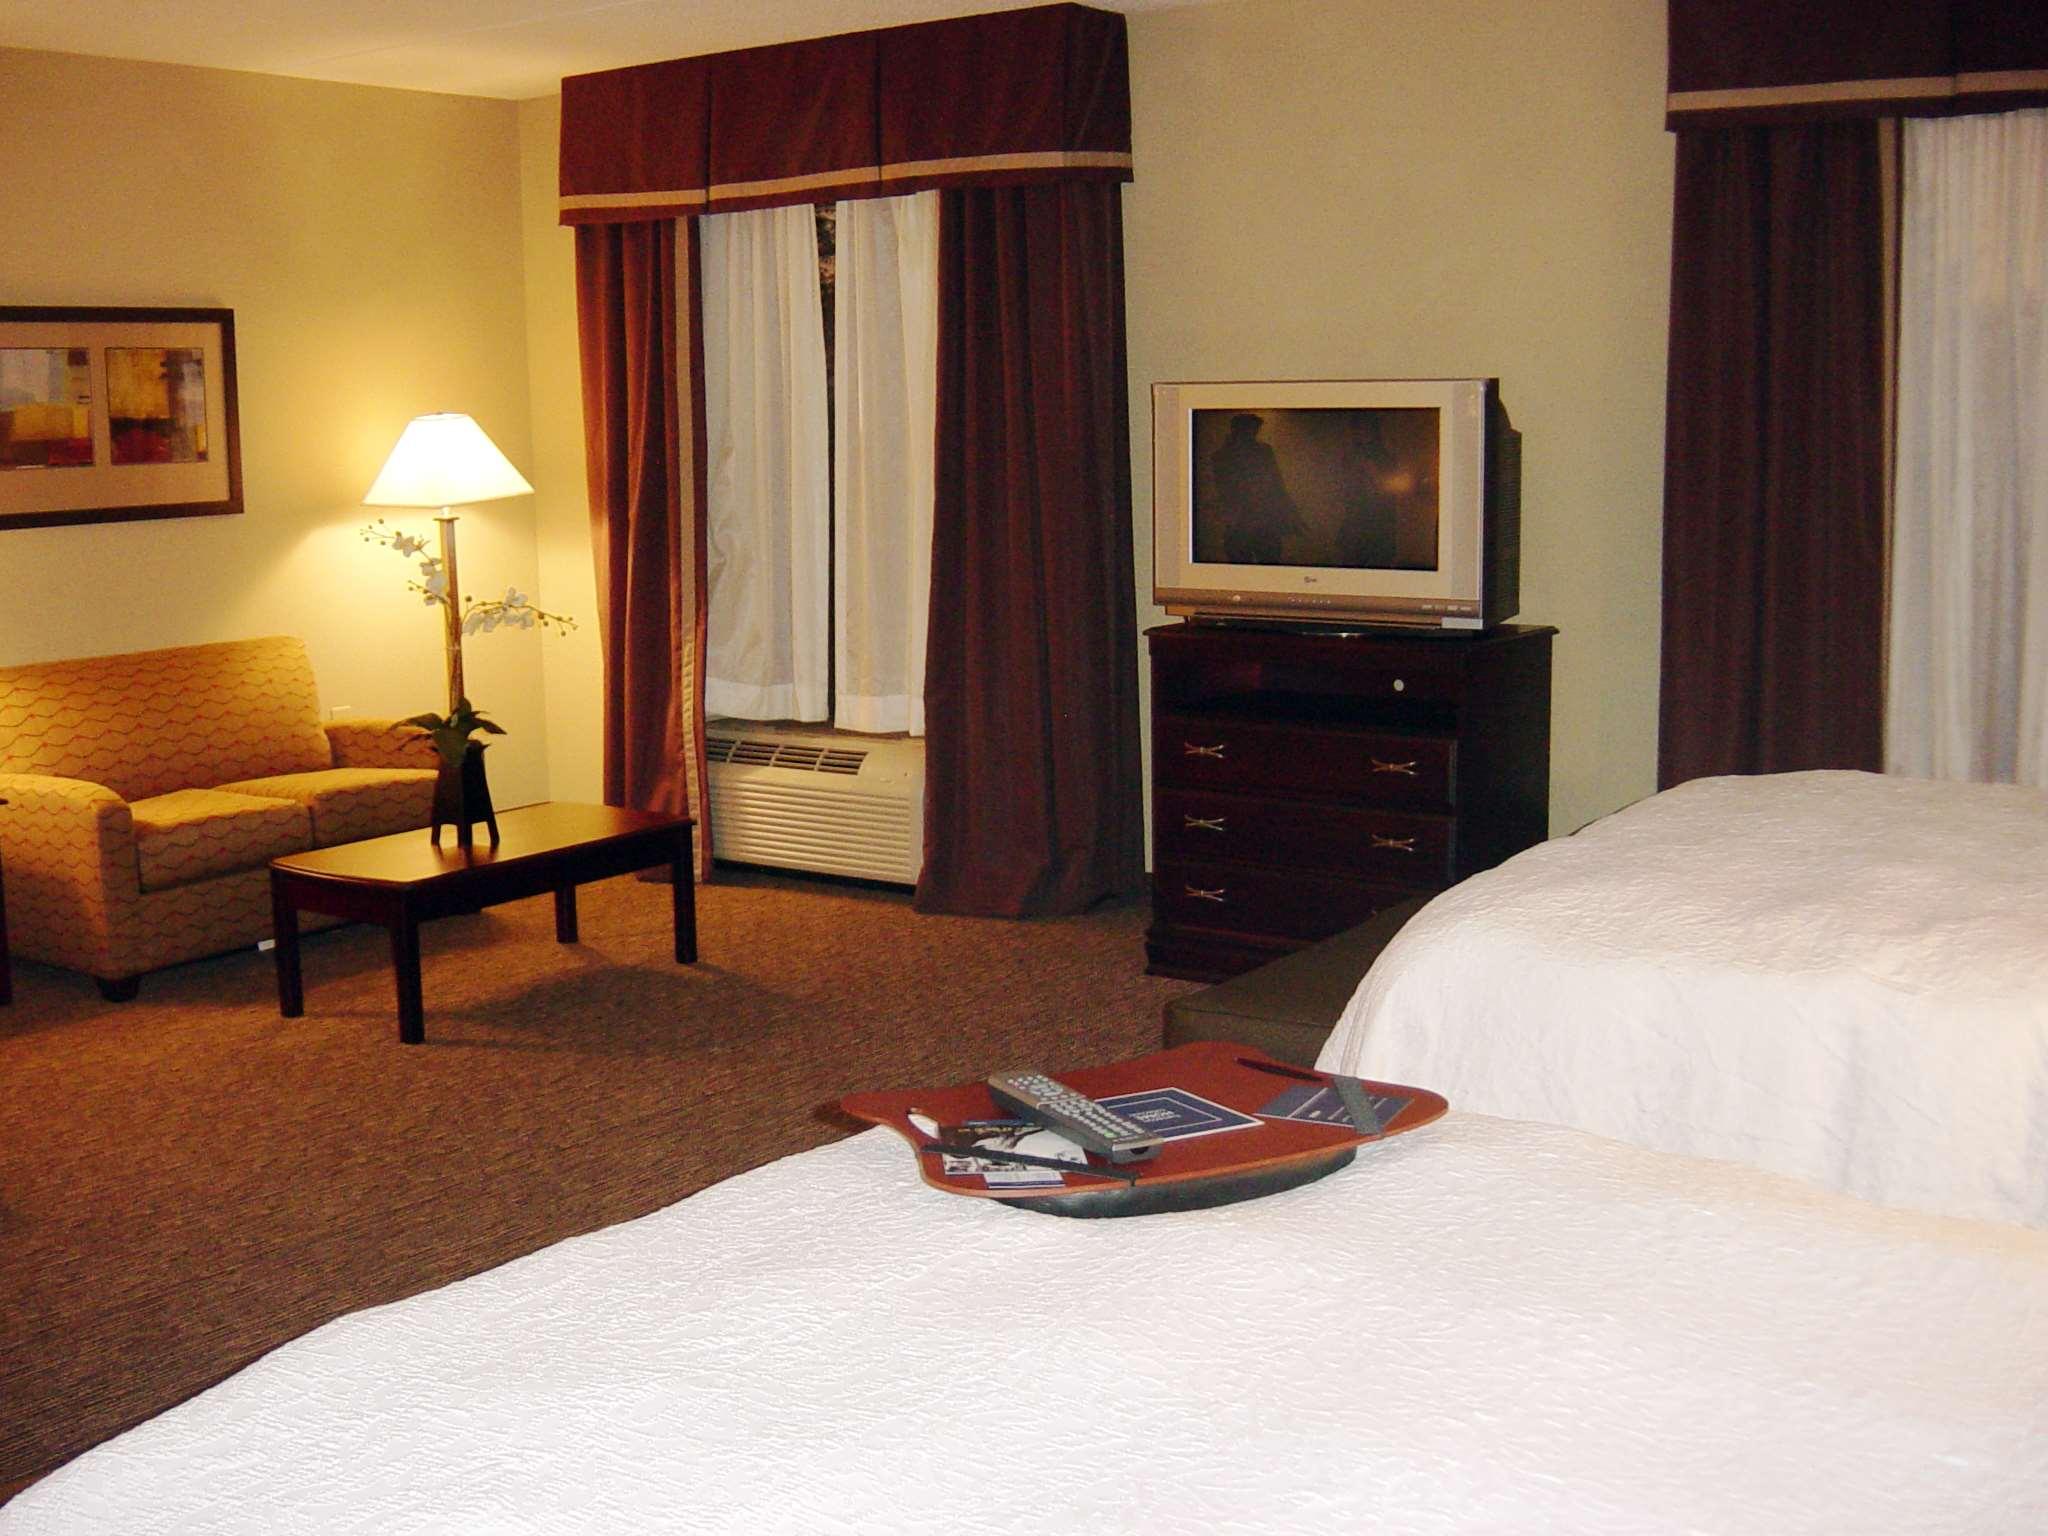 Hampton Inn & Suites Burlington image 21